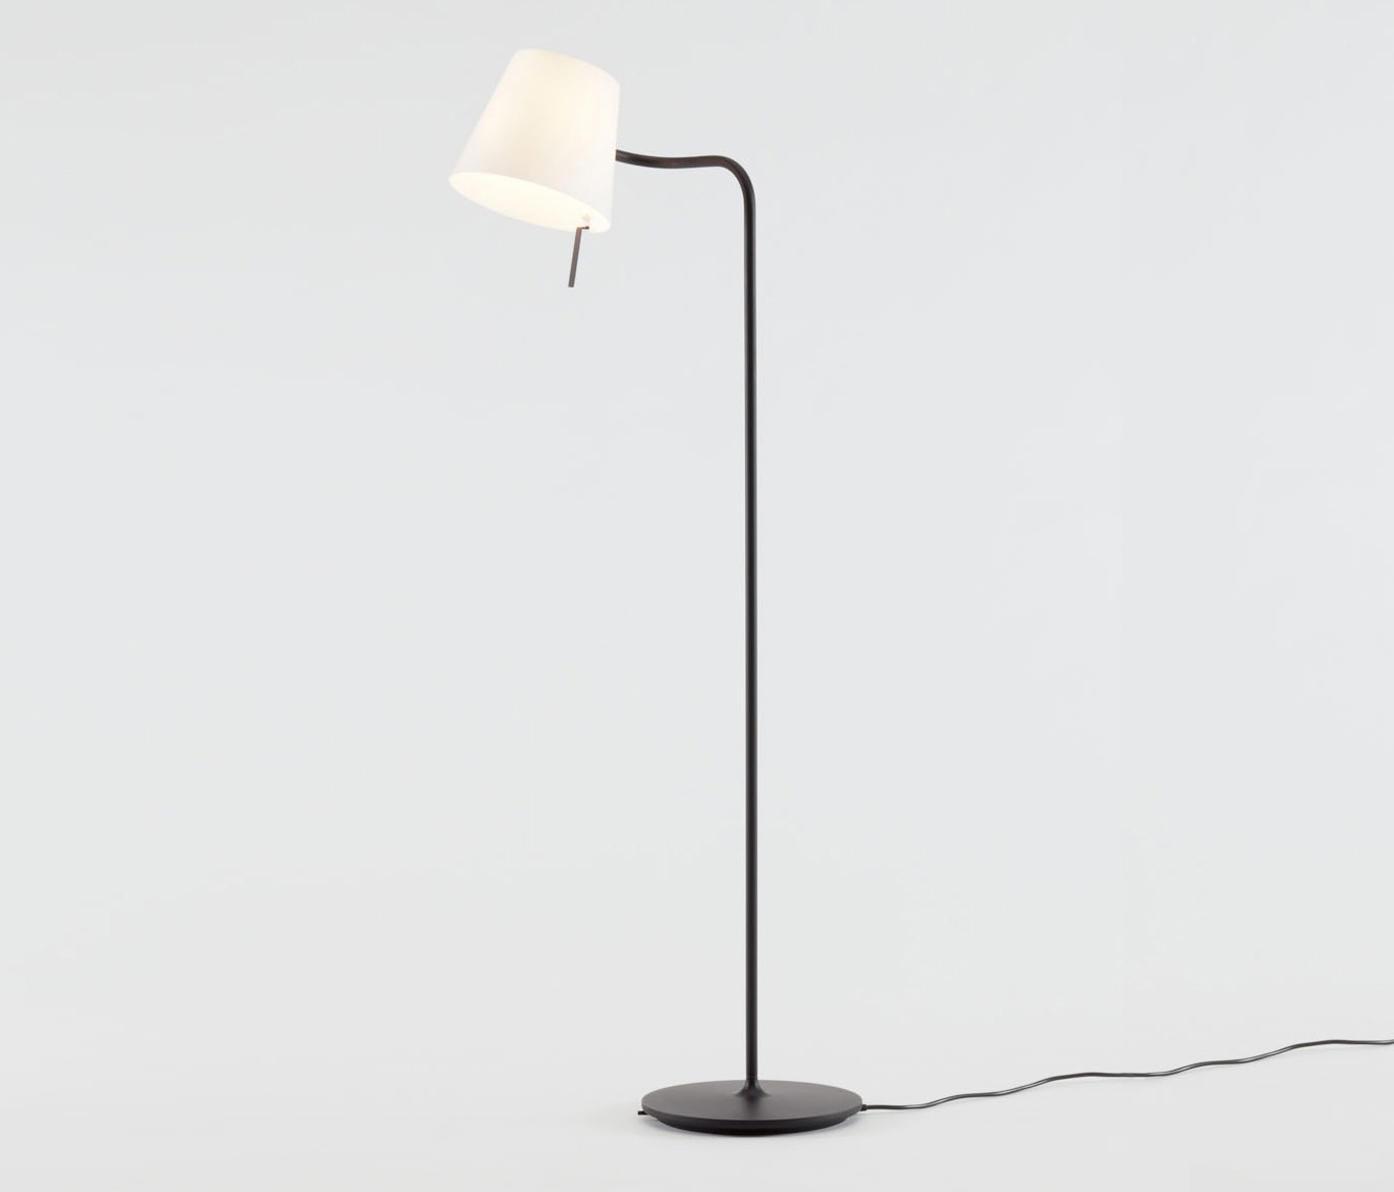 elane floor general lighting from architonic. Black Bedroom Furniture Sets. Home Design Ideas